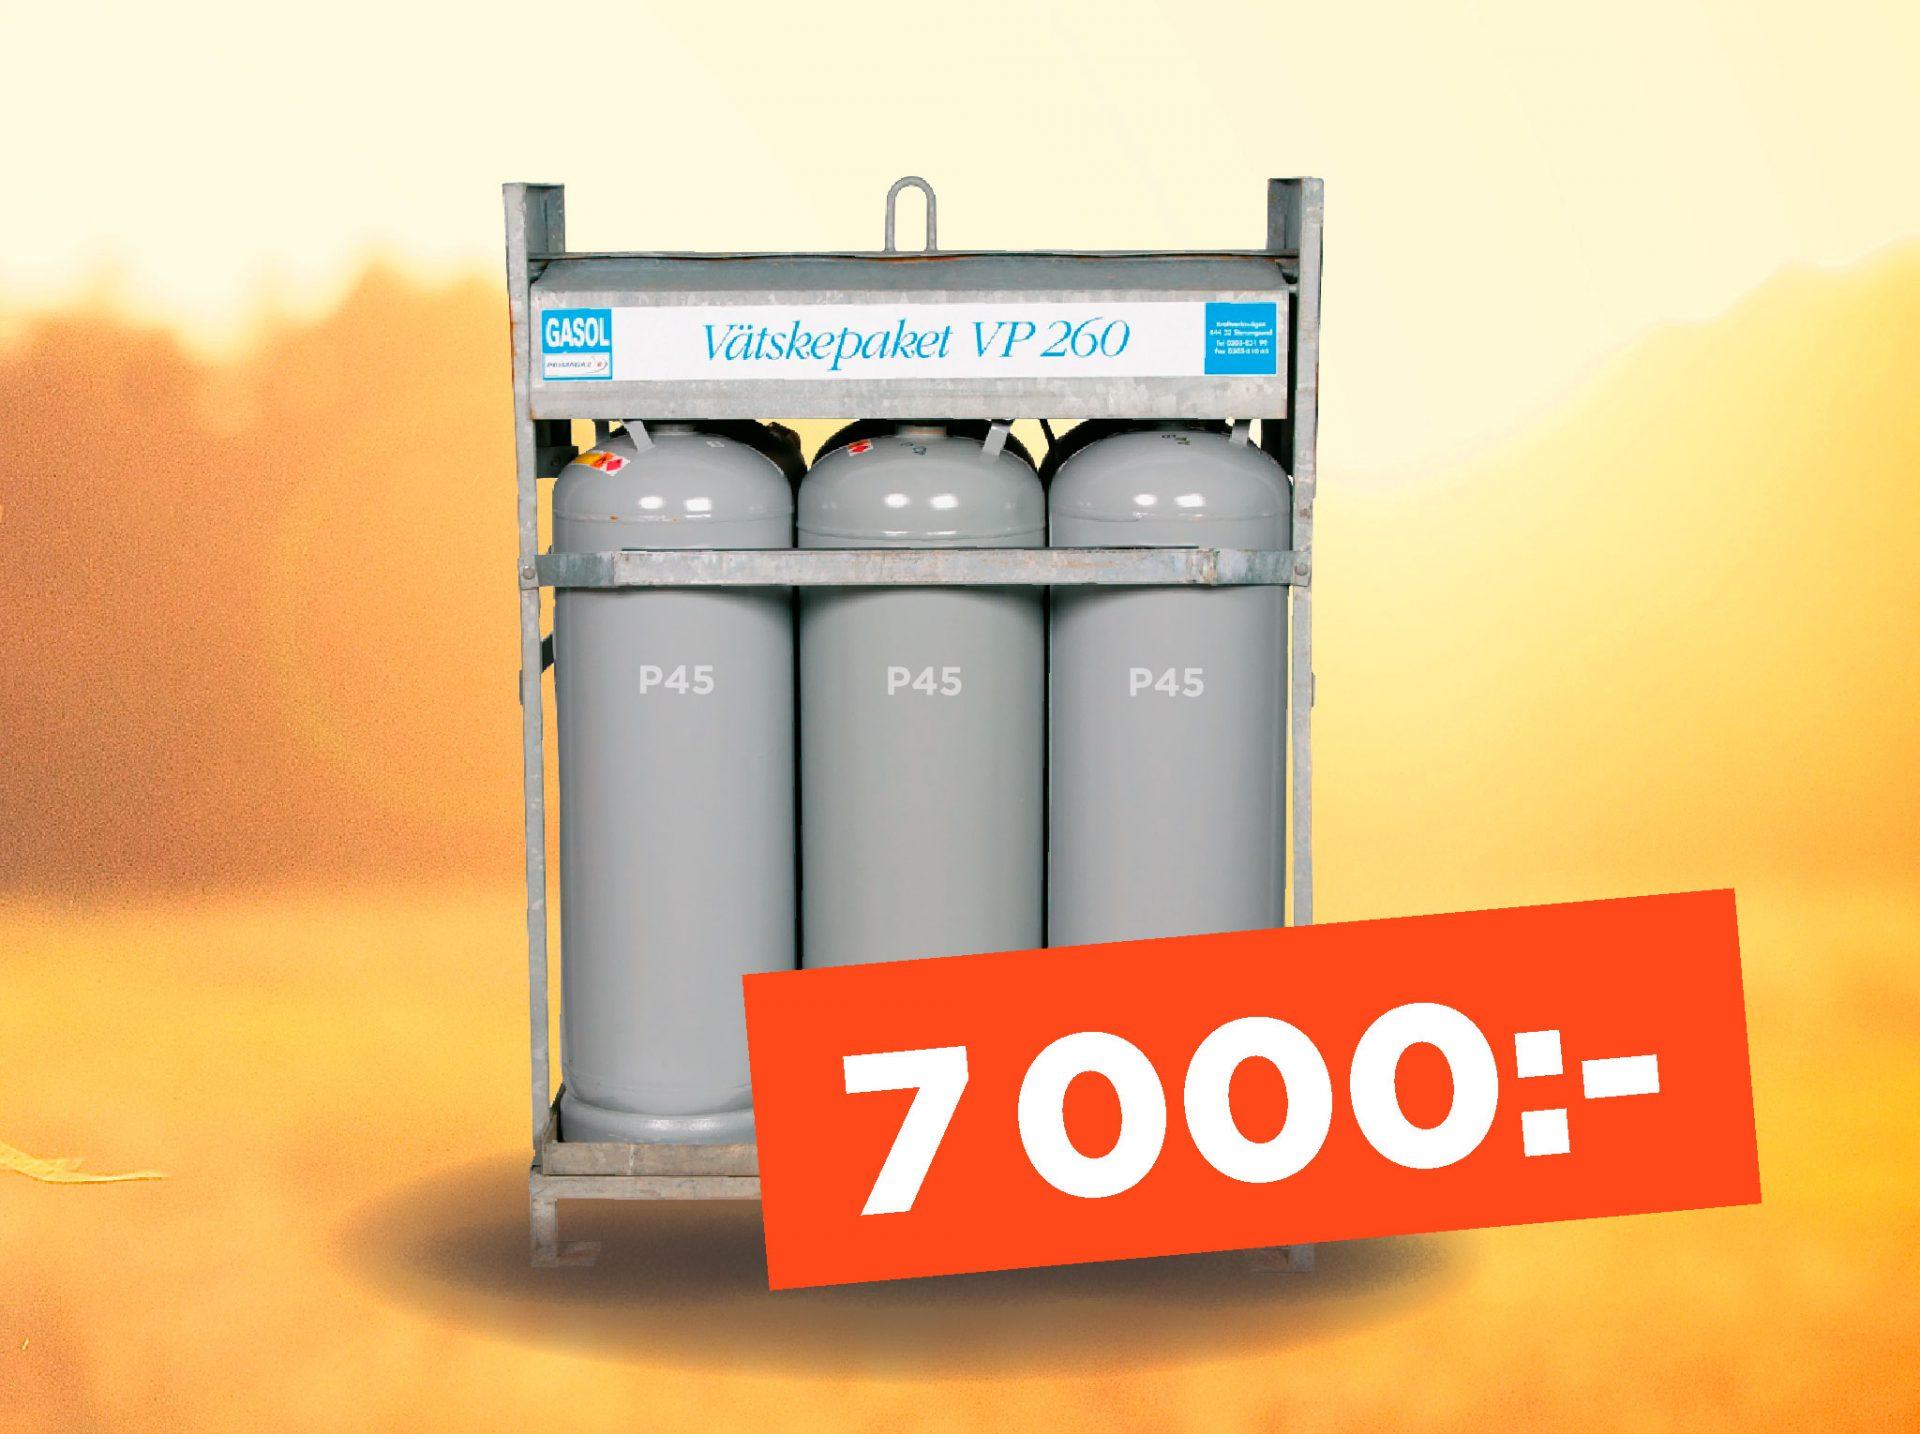 Gasolpaket-P260